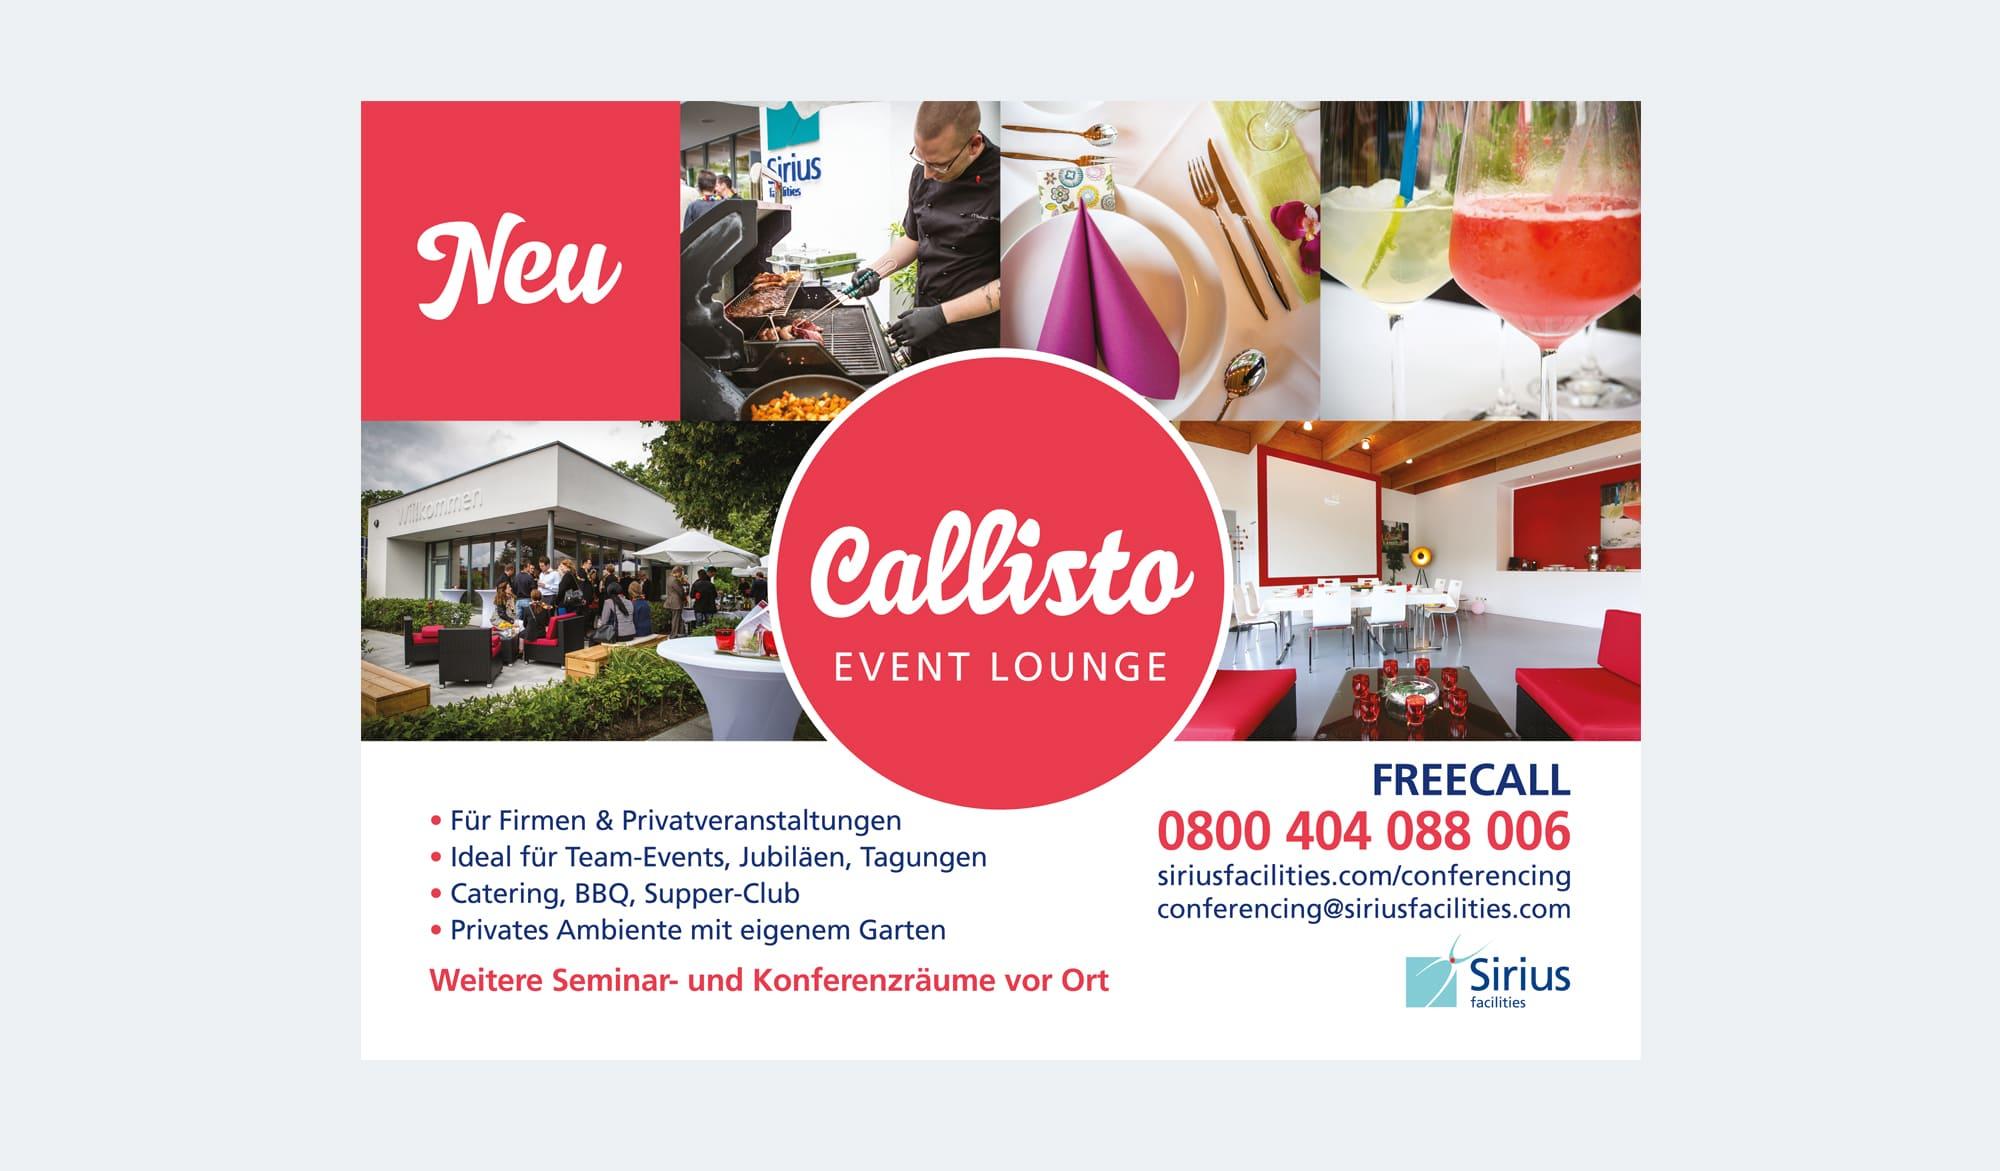 Callisto event lounge - signage